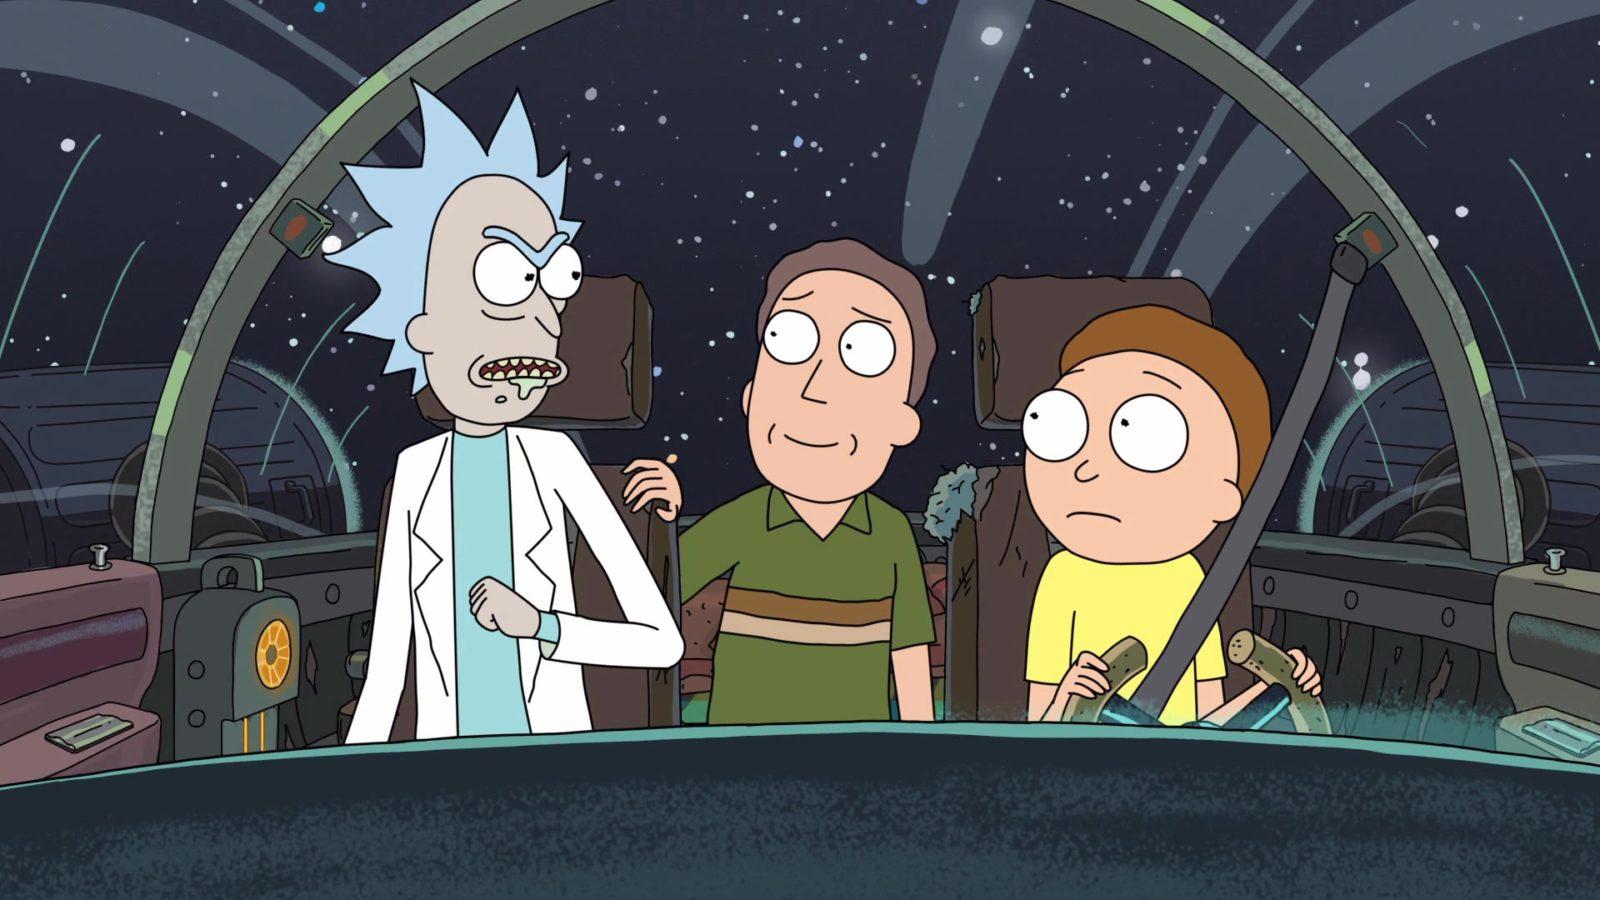 Рик, Морти и Джерри 2